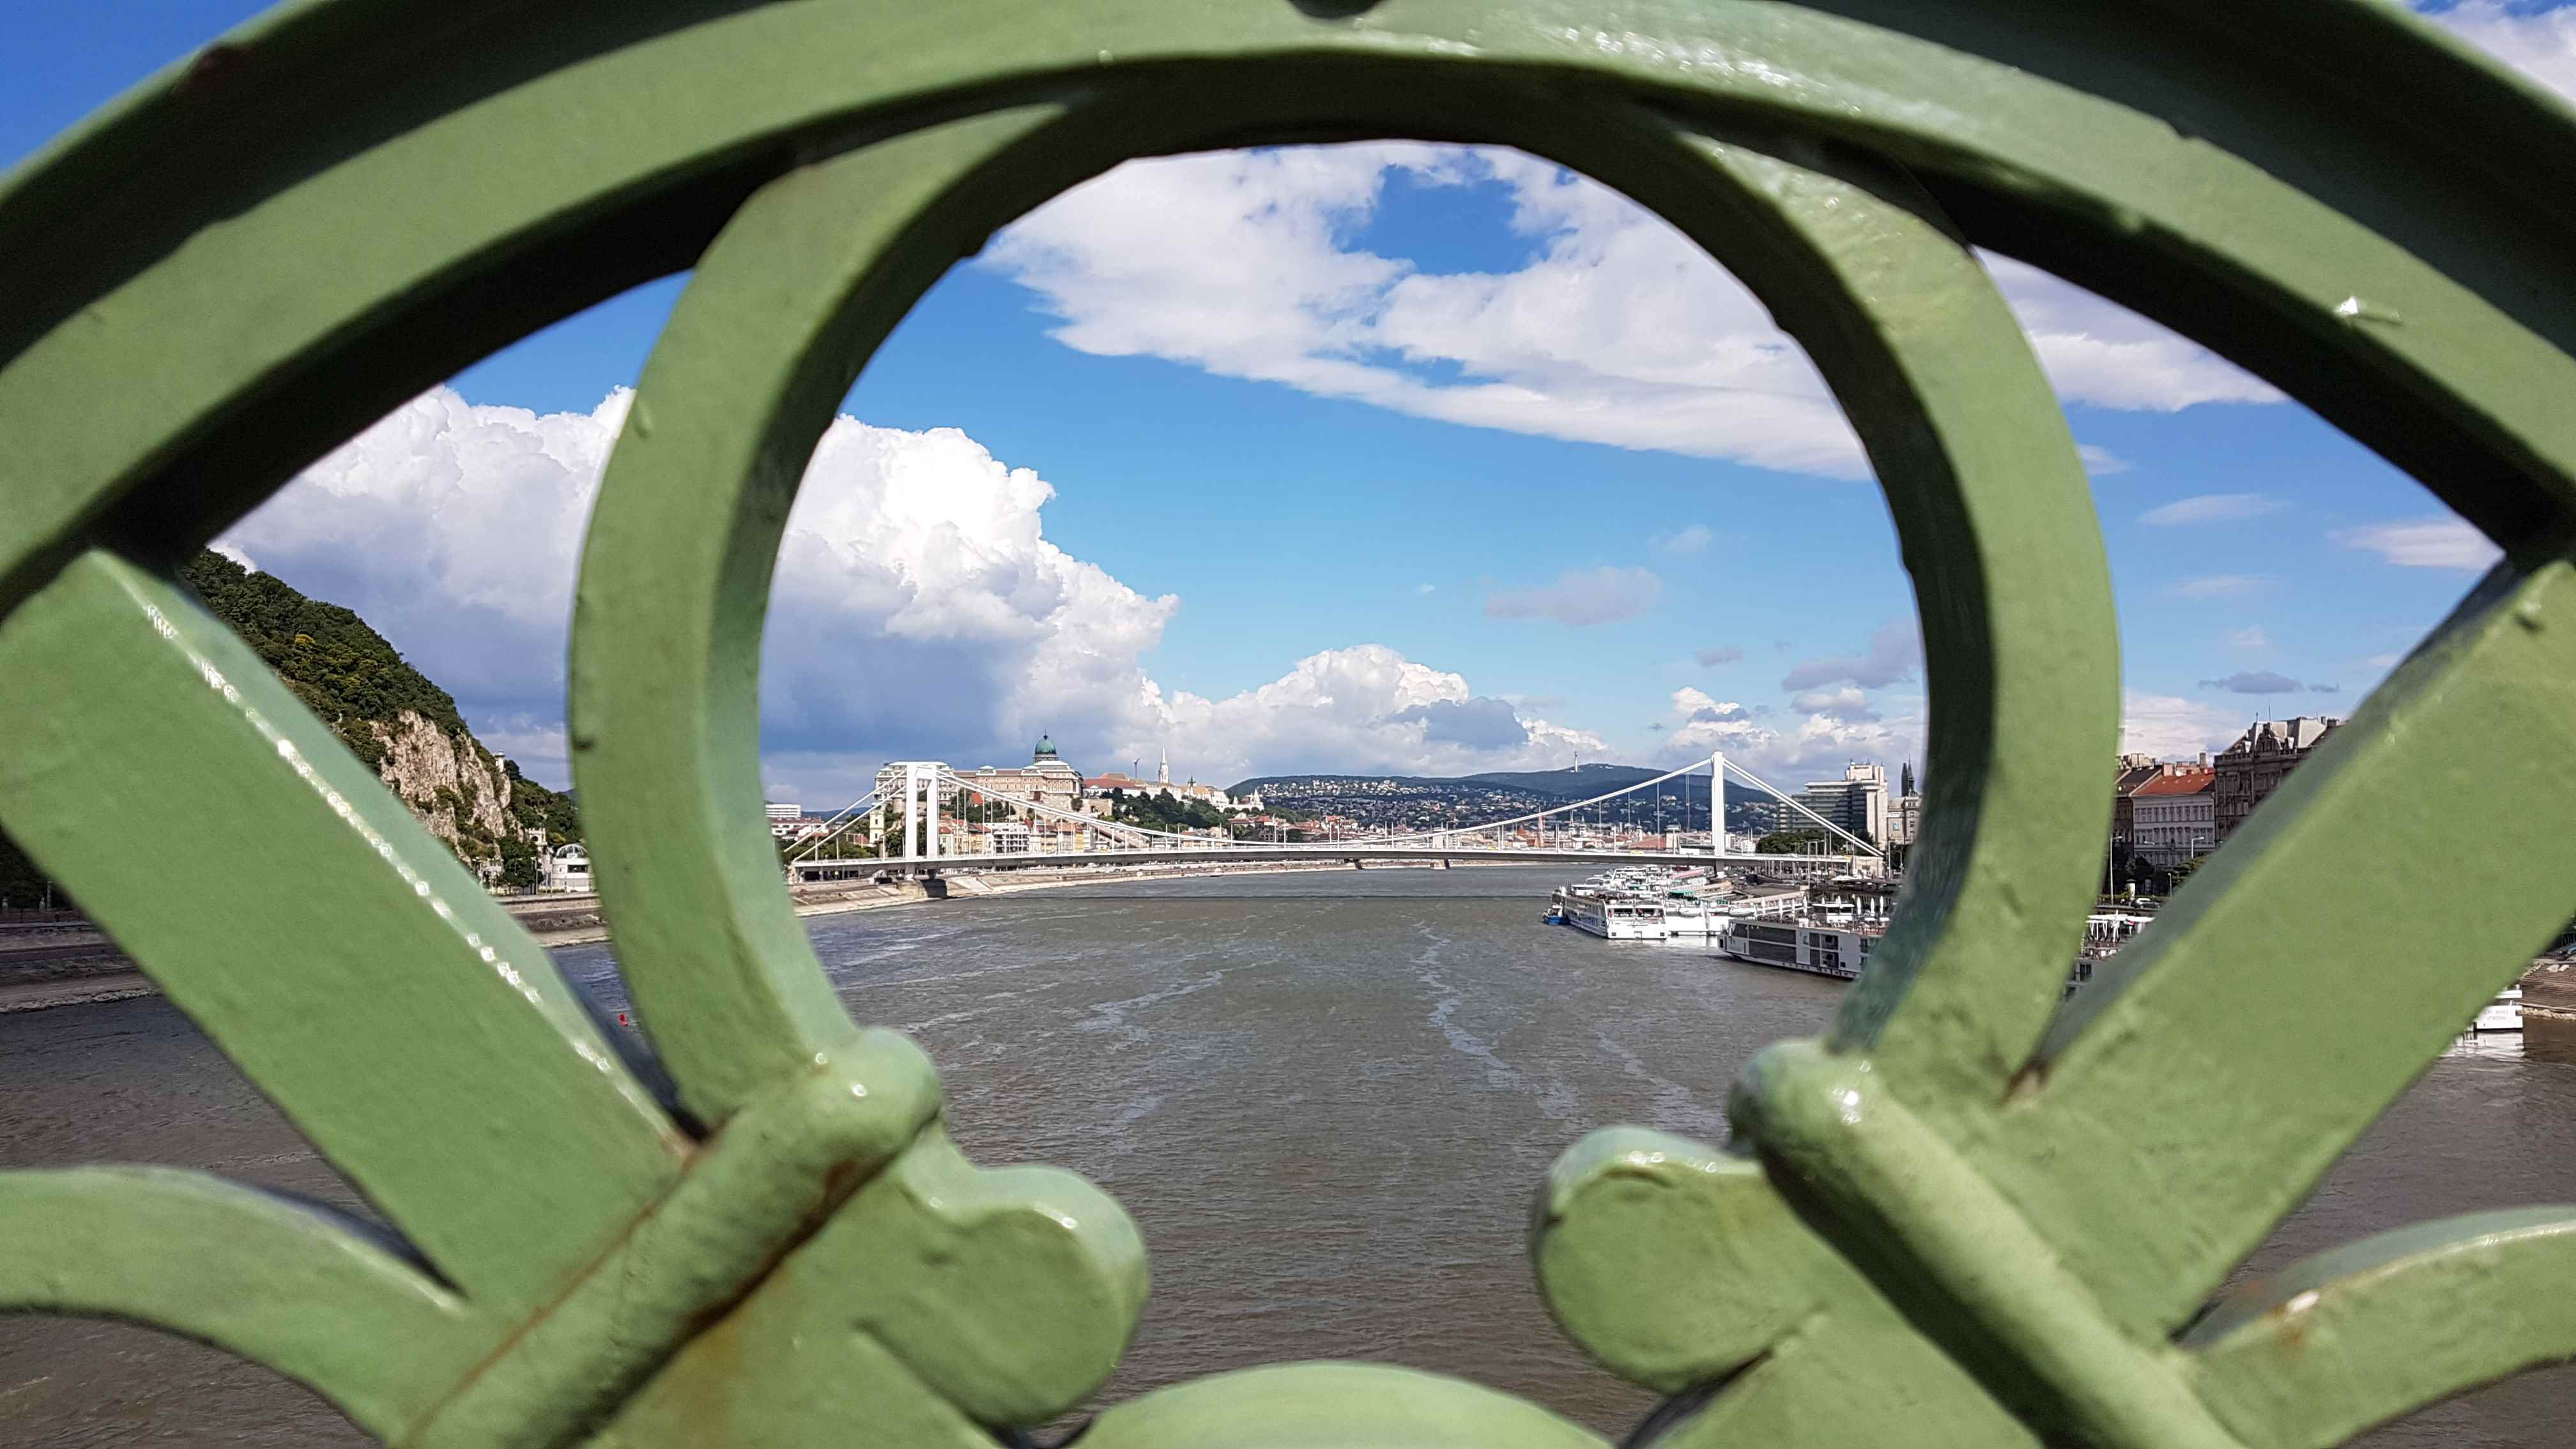 yesempatik-budapeste-gezi-seyahat-liberty-bridge